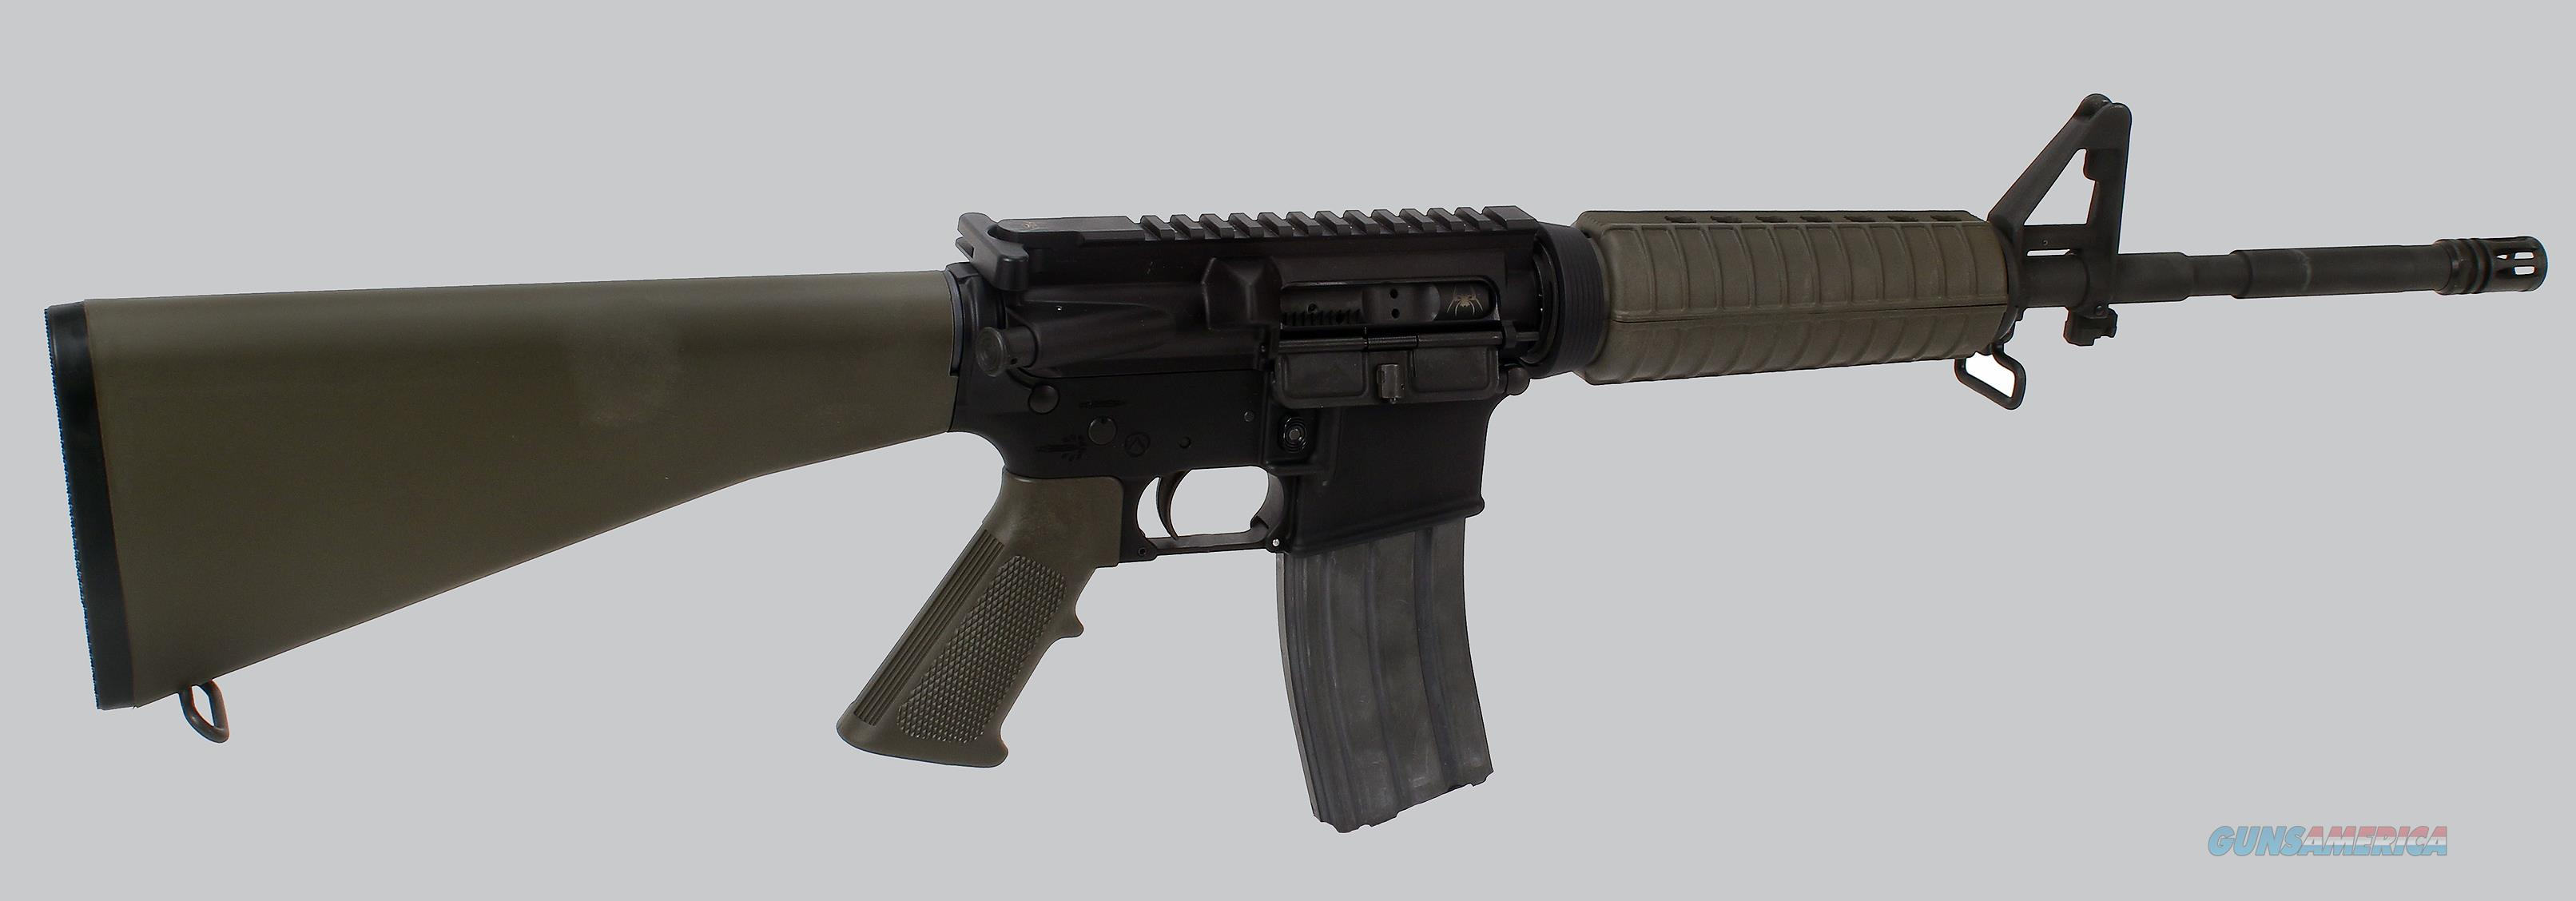 Spikes Tactical 5.56 ST15 Rifle  Guns > Rifles > Spikes Tactical Rifles